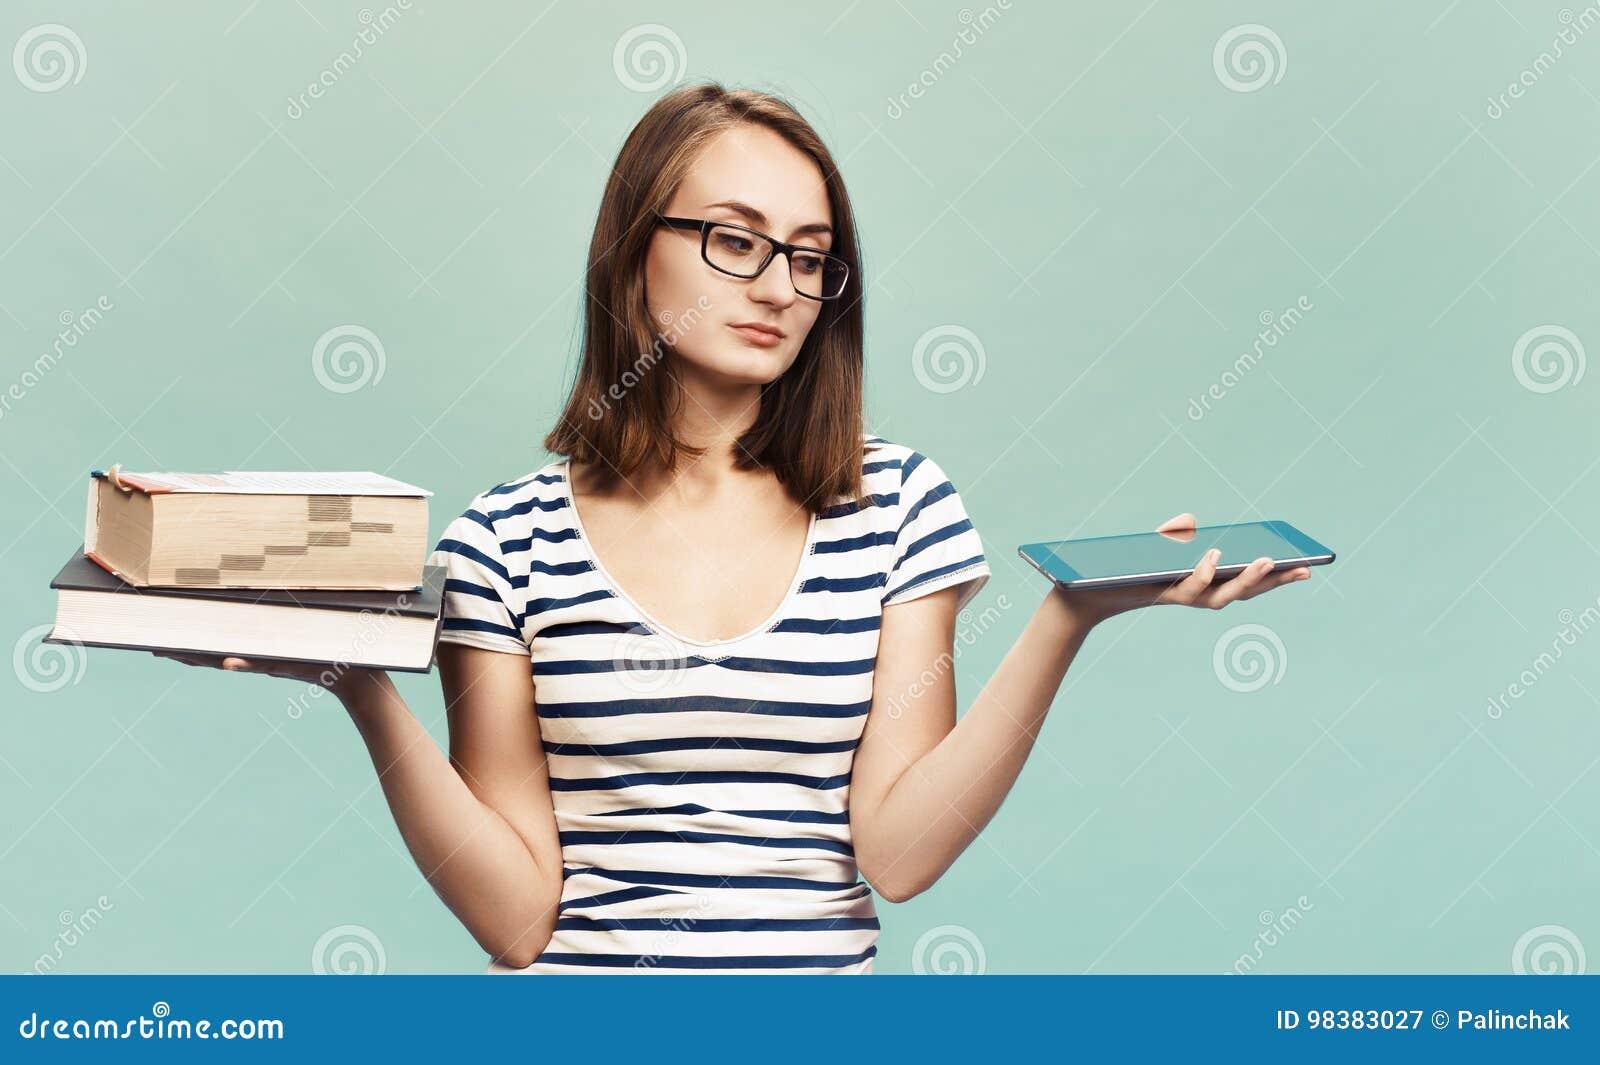 Ebook Vs Book Stock Image Image Of Girl Ebook Choosing